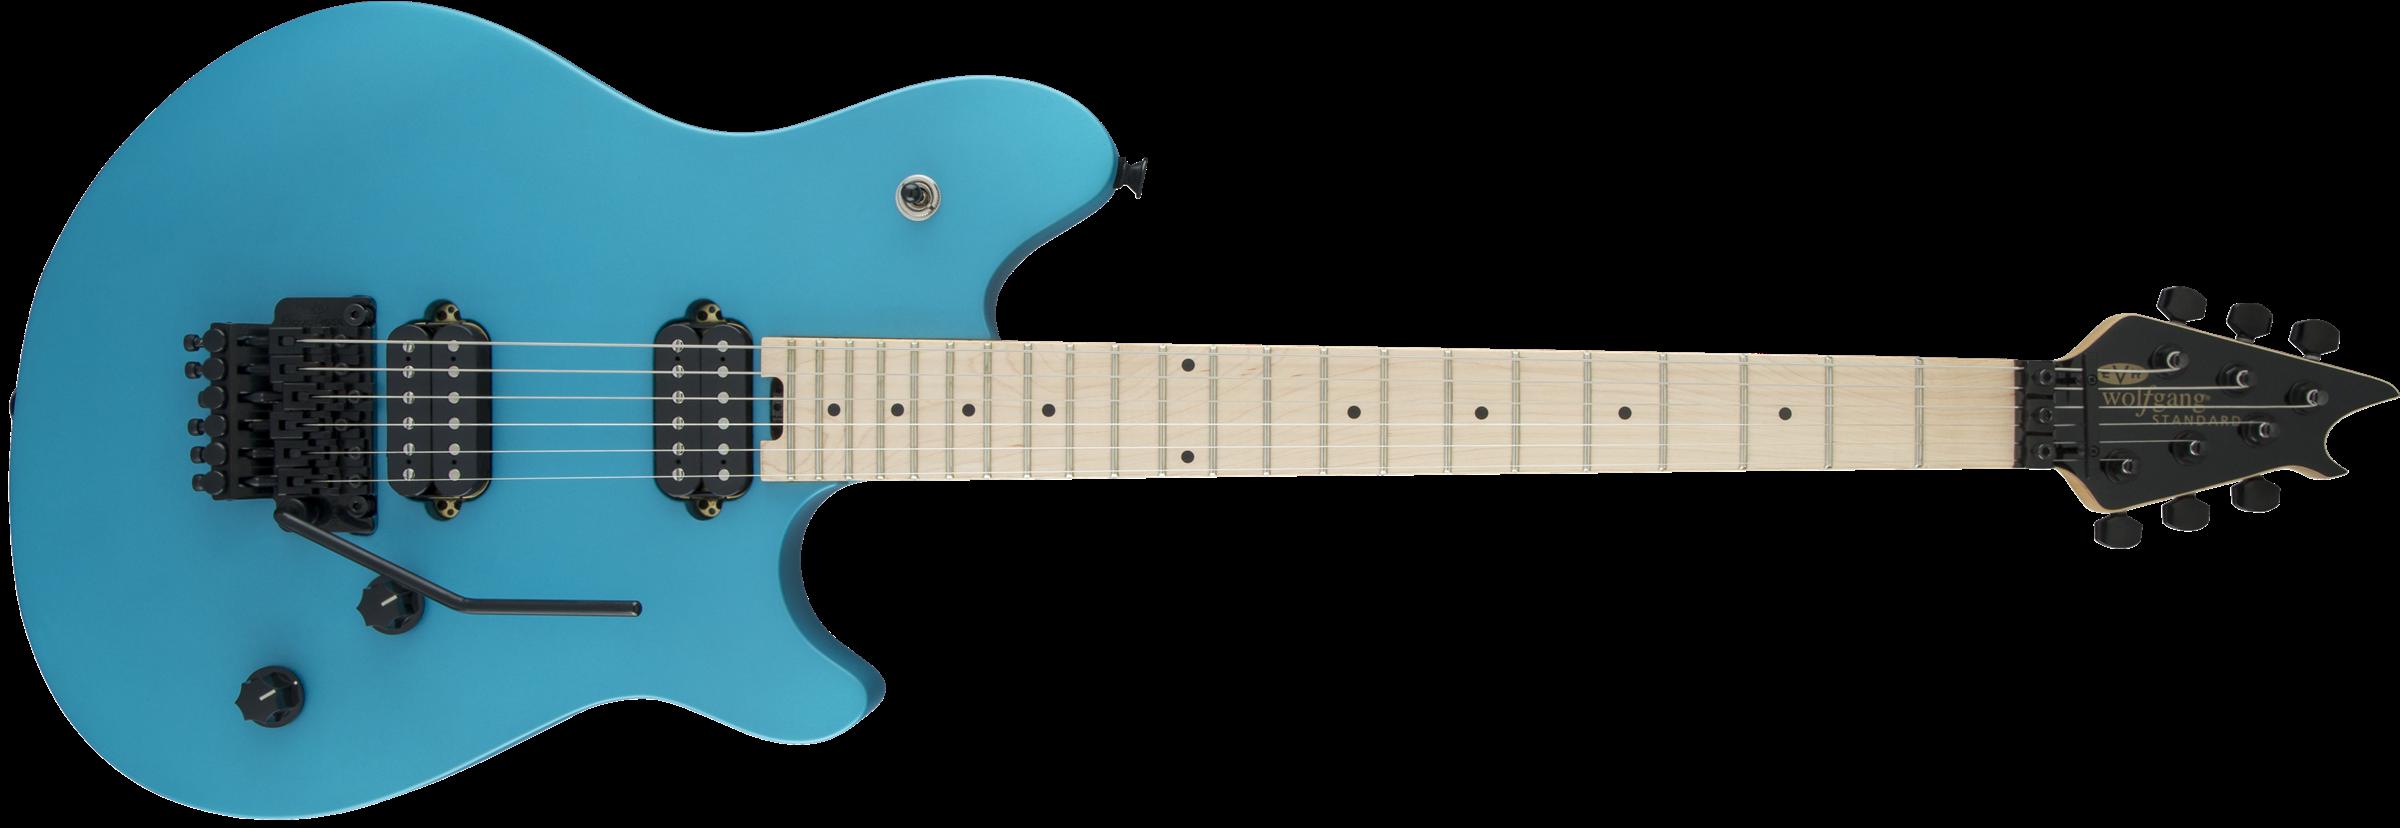 Fender Evh Wolfgang Wiring Diagram - WIRE Center •